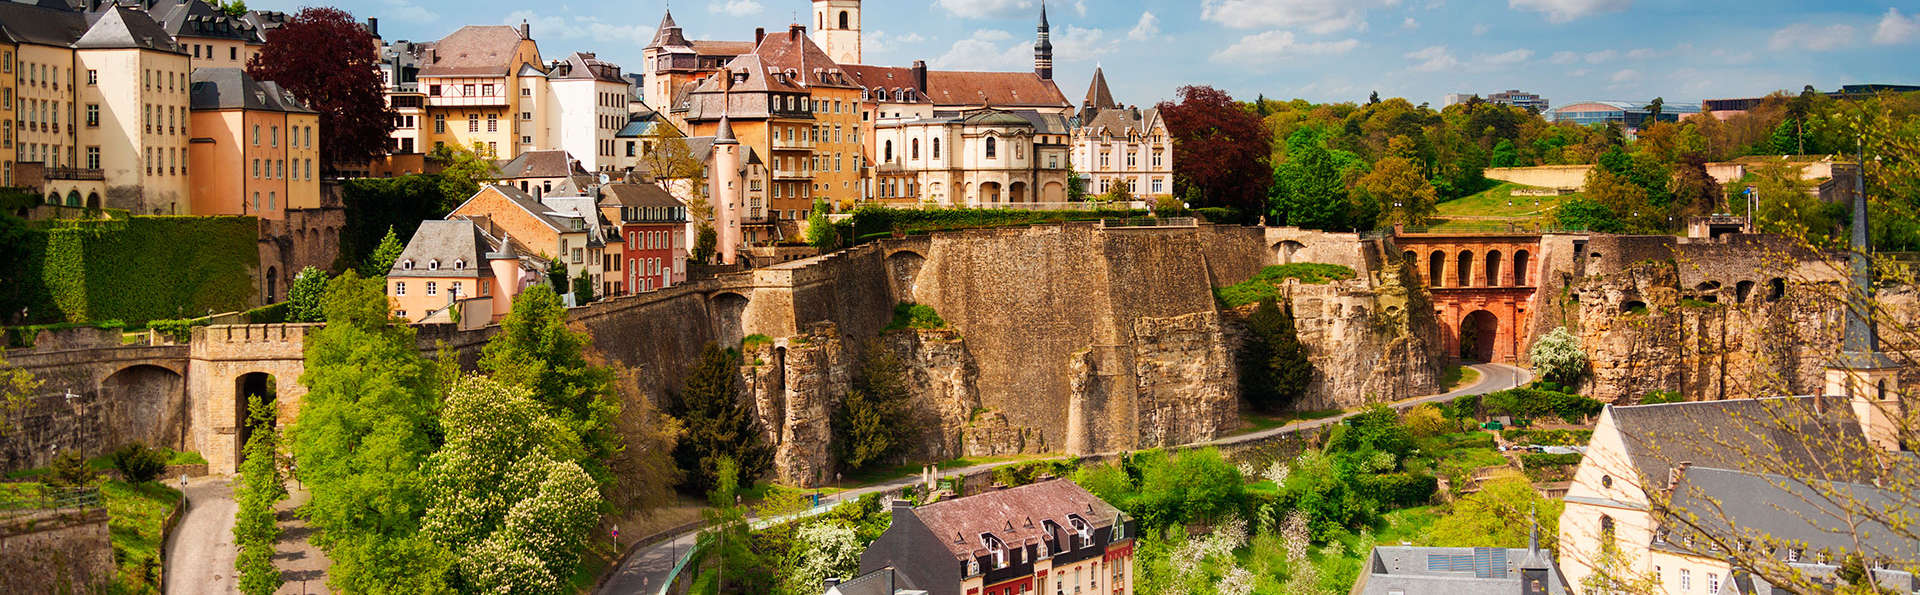 DoubleTree by Hilton Luxembourg - EDIT_luxemburgo54.jpg